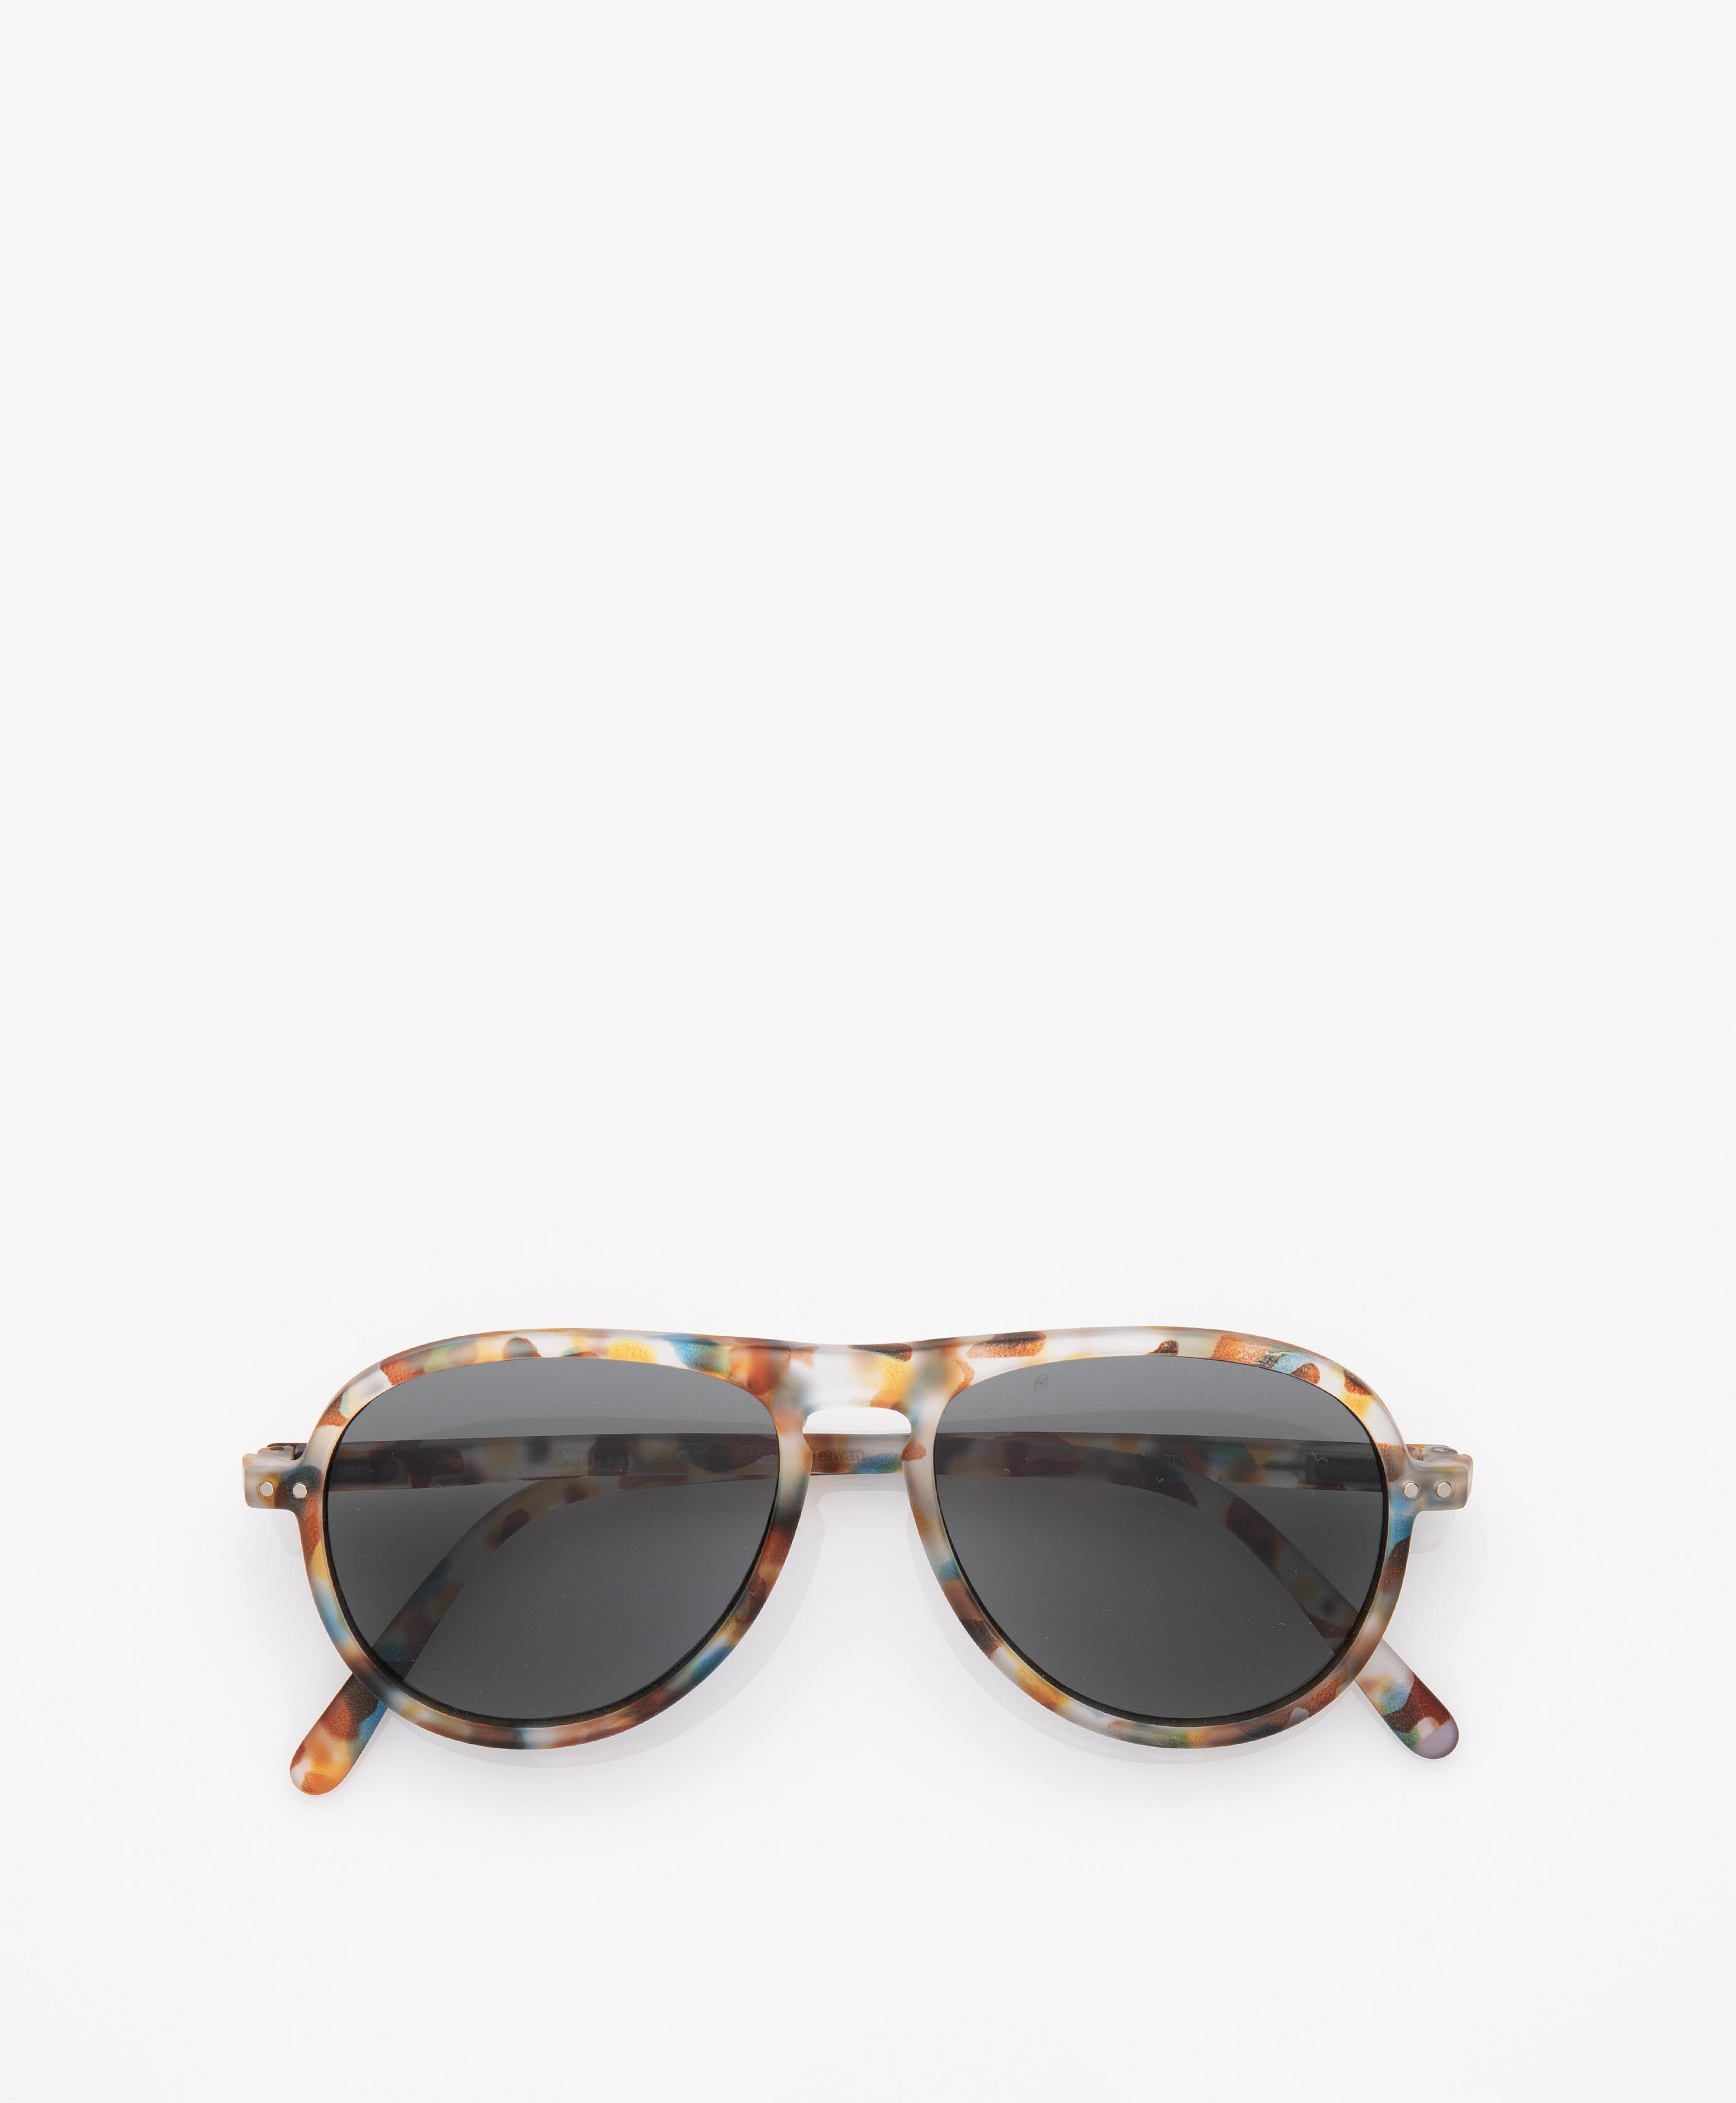 62ea4bcfc29 IZIPIZI SUN  I Sunglasses - Blue Tortoise Grey Glasses - IZIPIZI